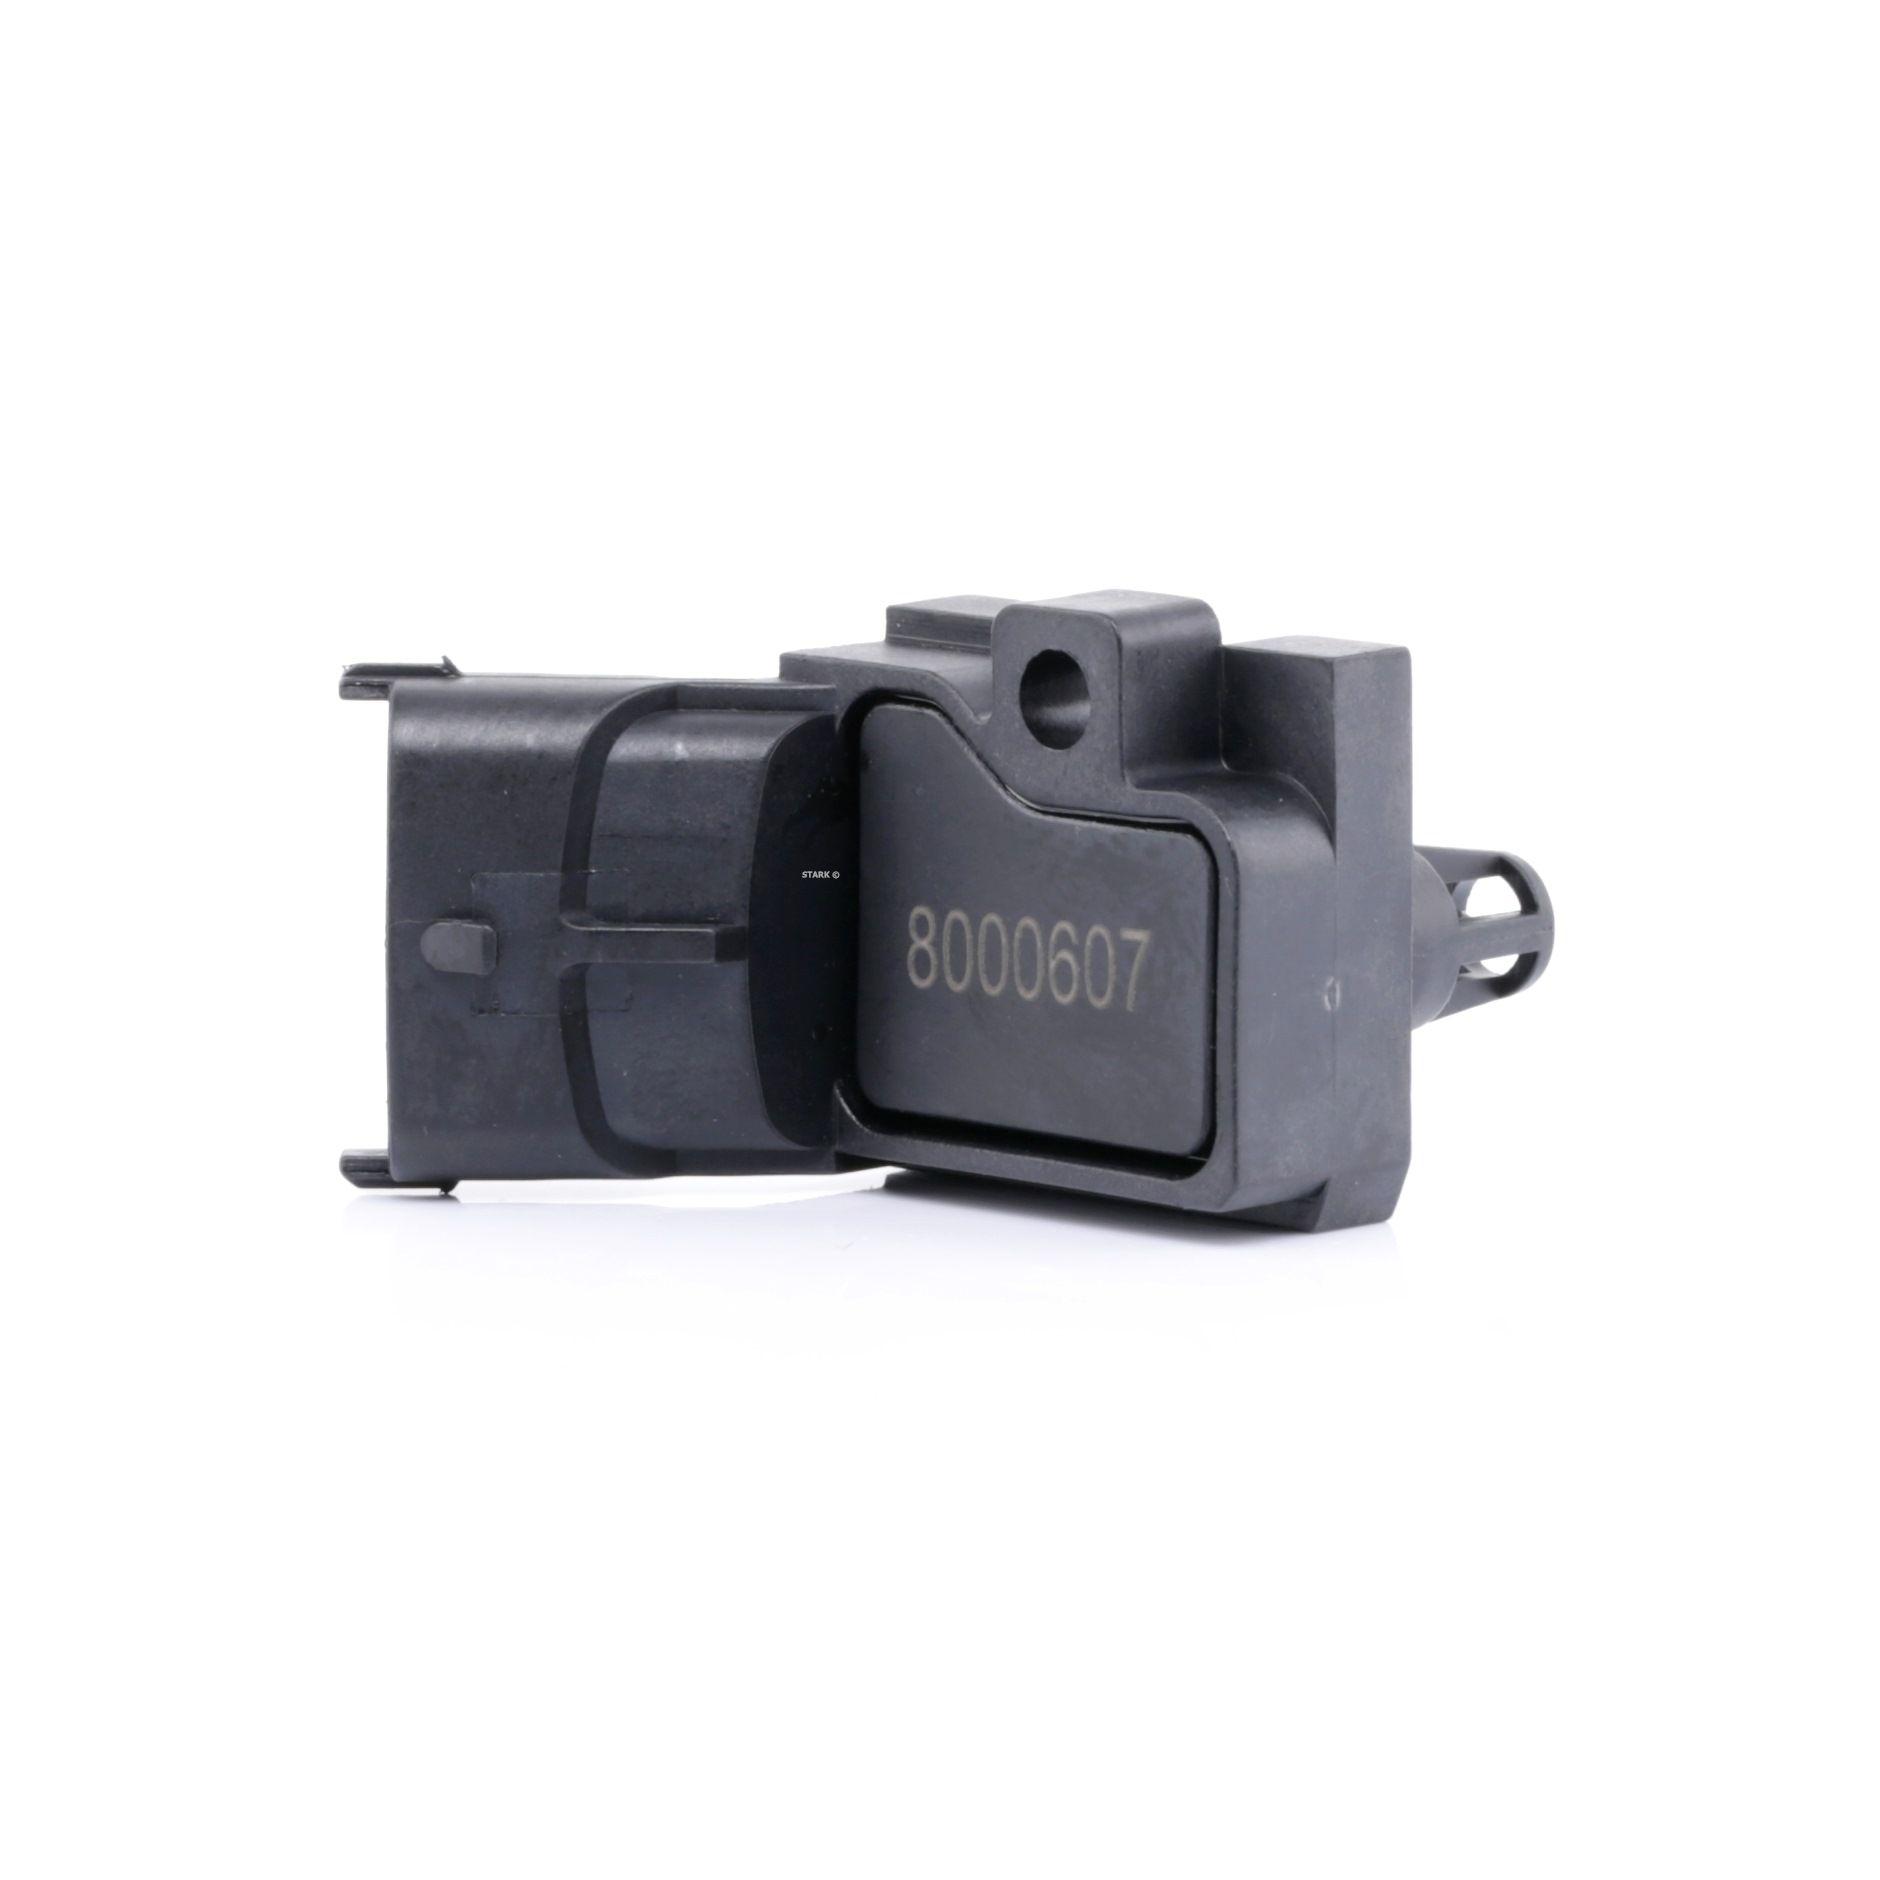 OE Original Map Sensor SKBPS-0390010 STARK